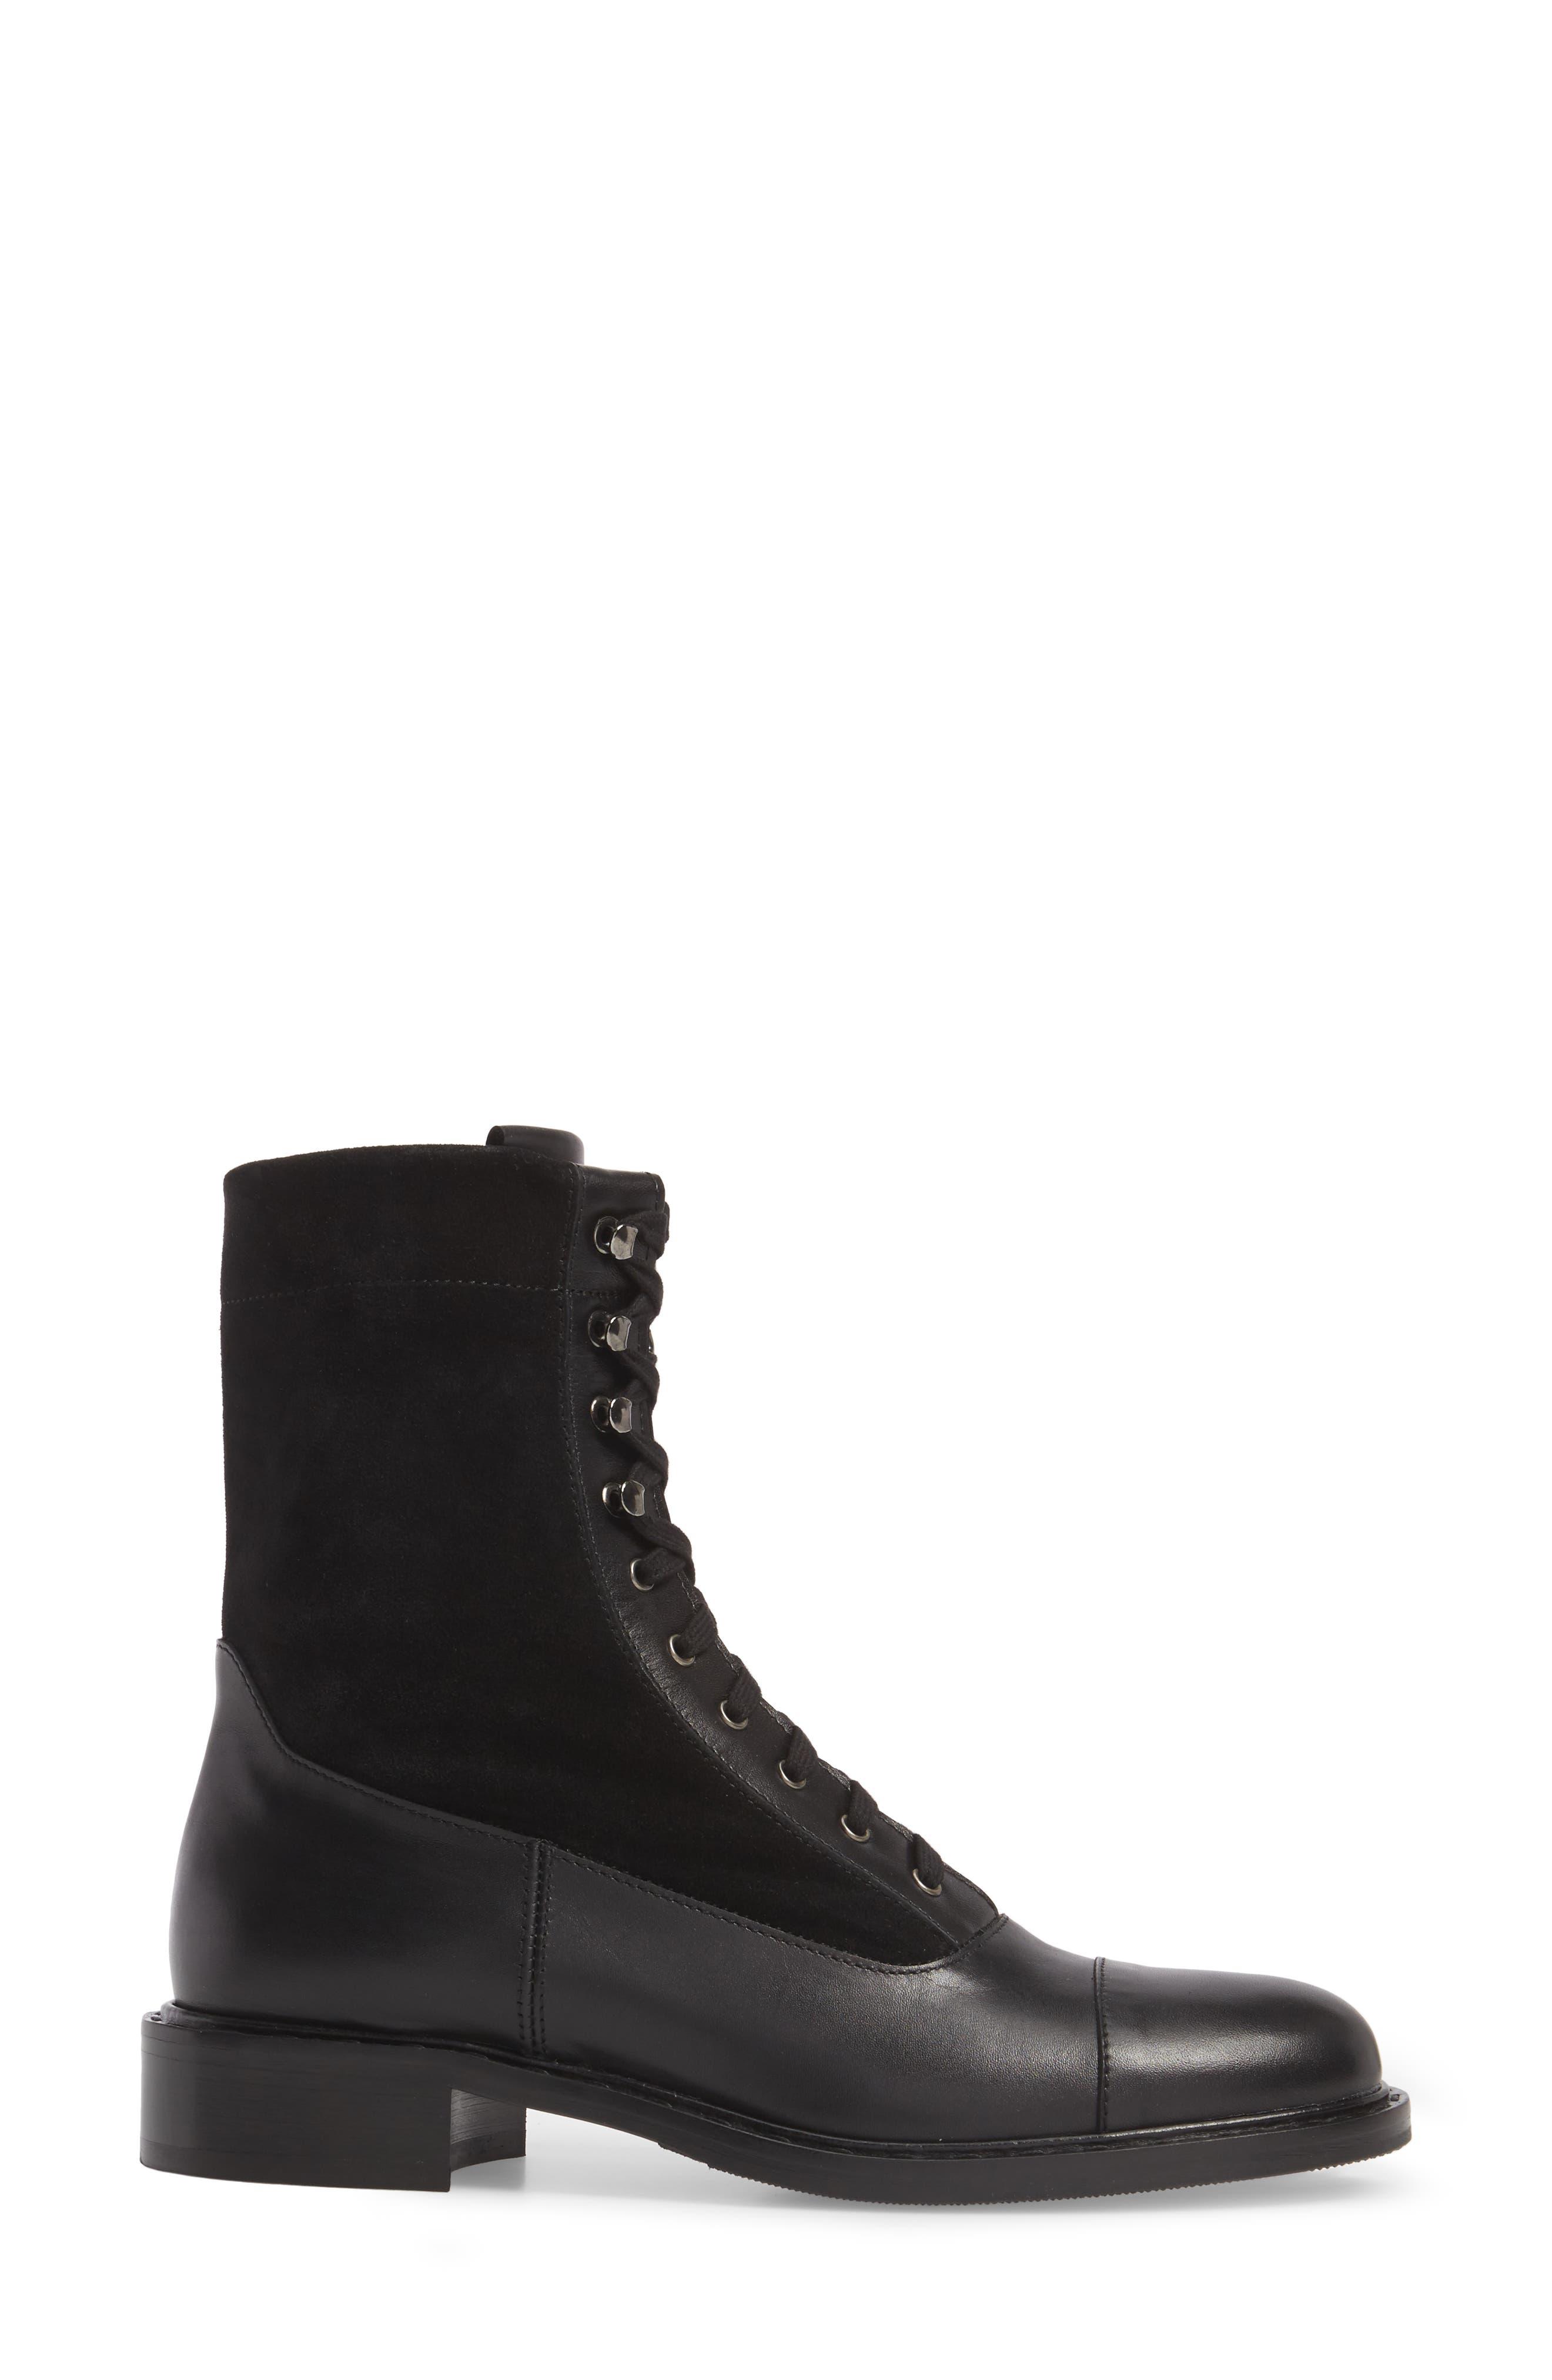 Brigitta Weatherproof Boot,                             Alternate thumbnail 3, color,                             Black/ Black